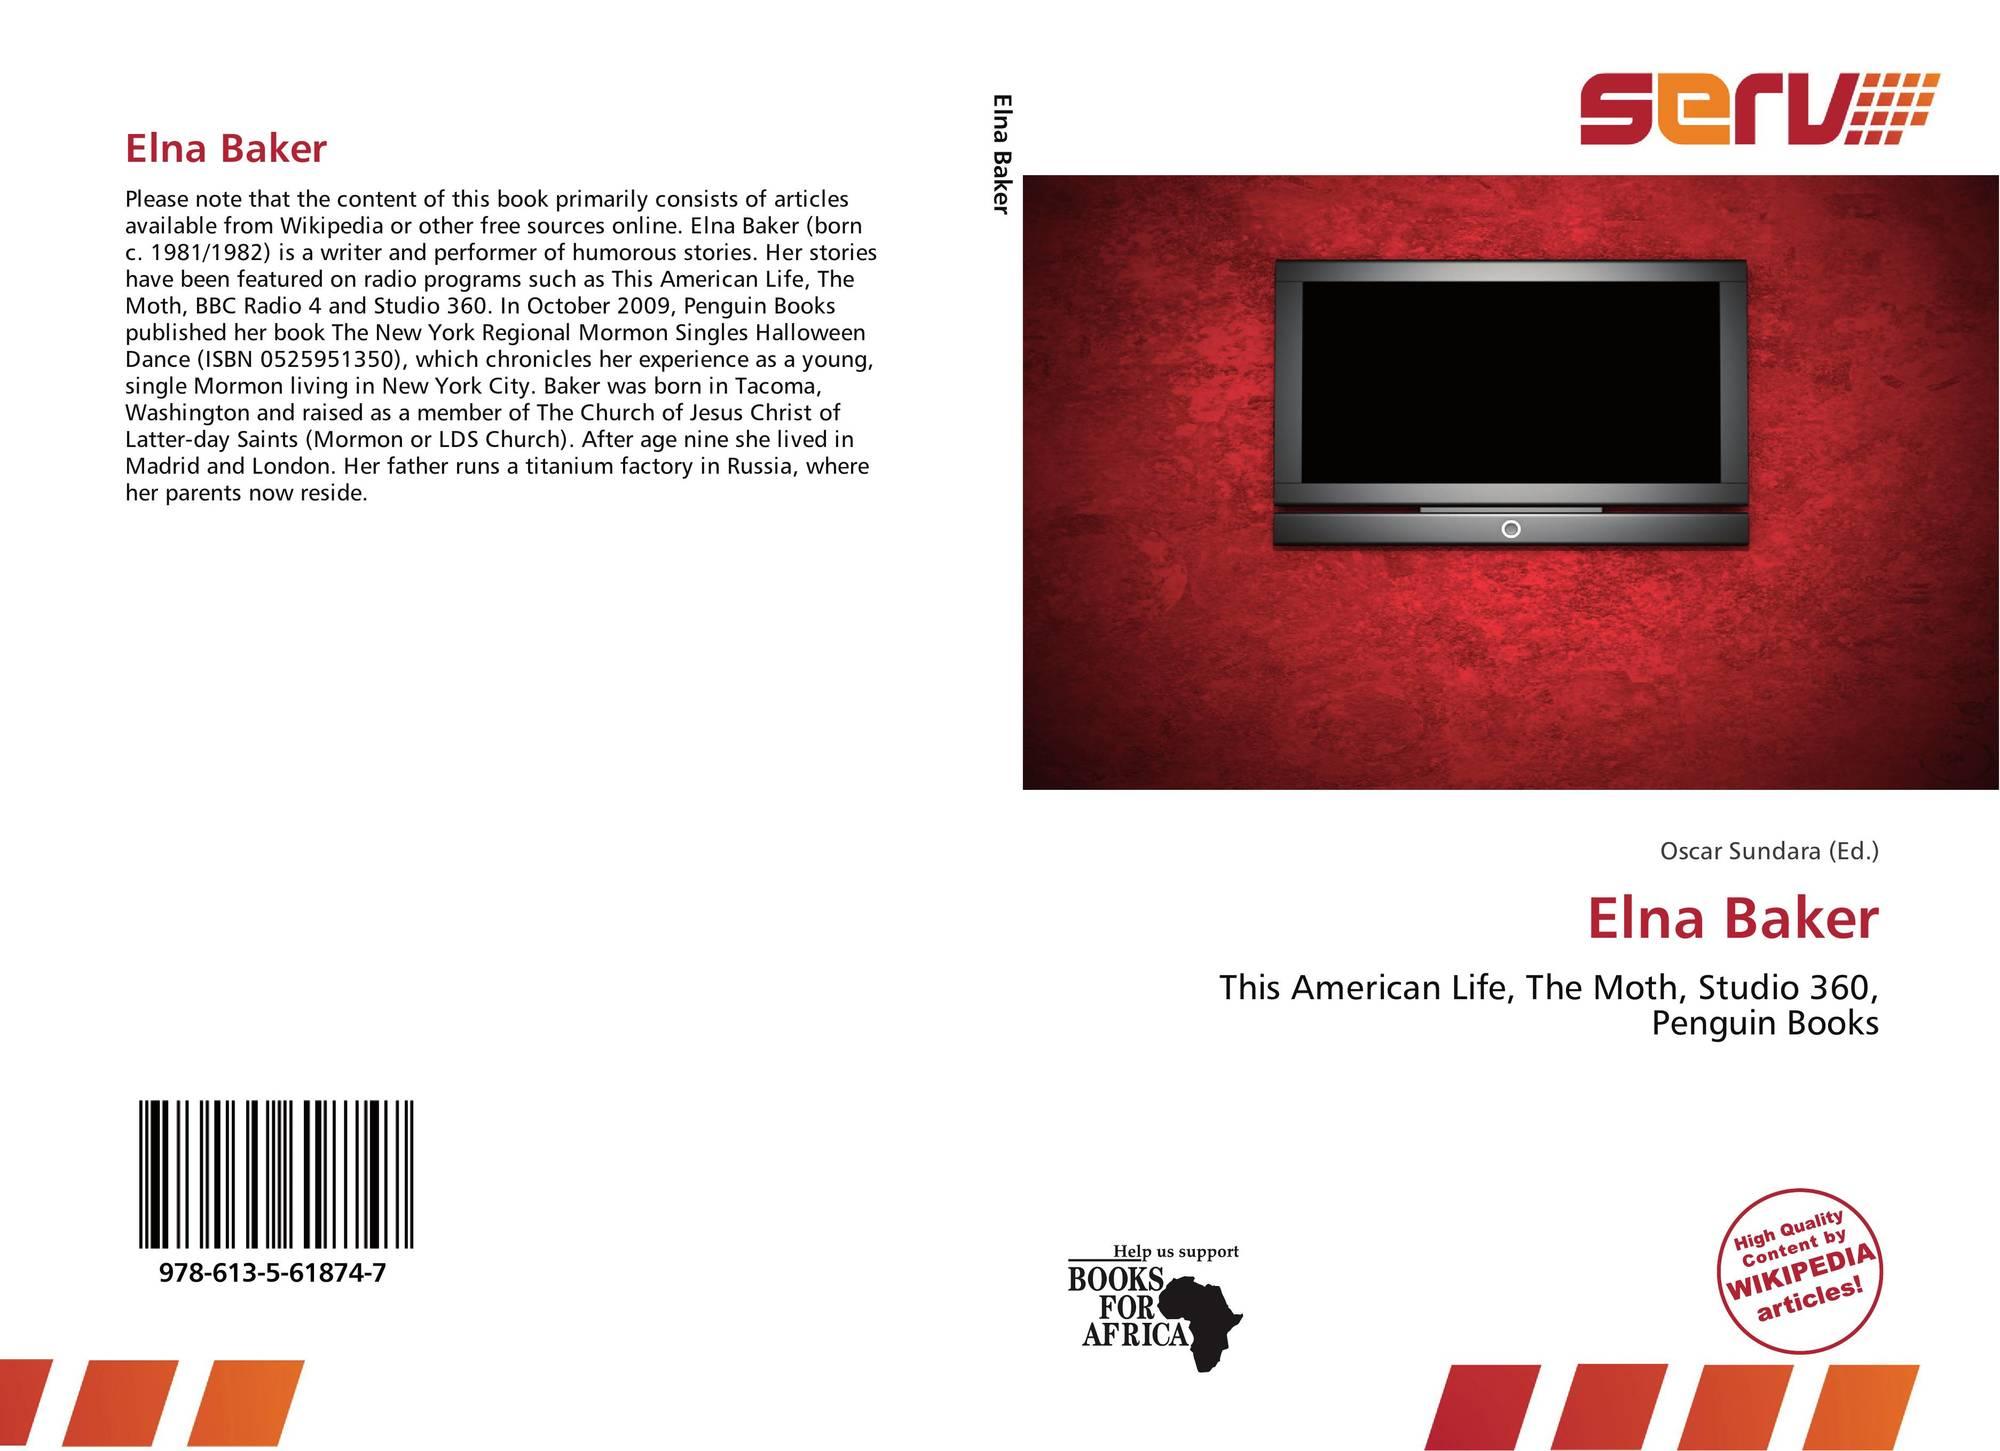 elna baker, 978-613-5-61874-7, 6135618741 ,9786135618747